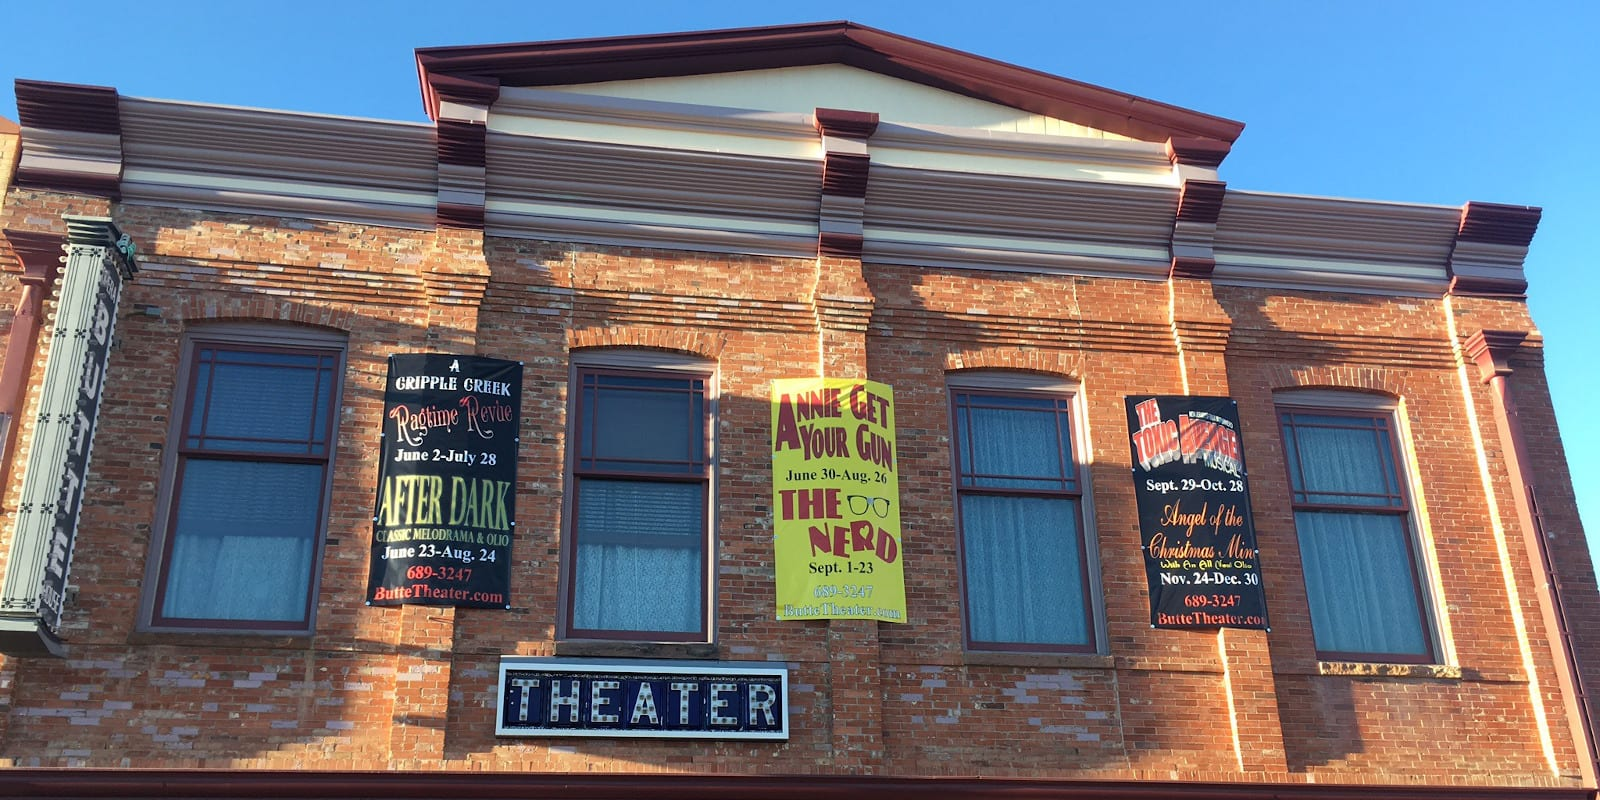 The Butte Theatre in Cripple Creek, CO